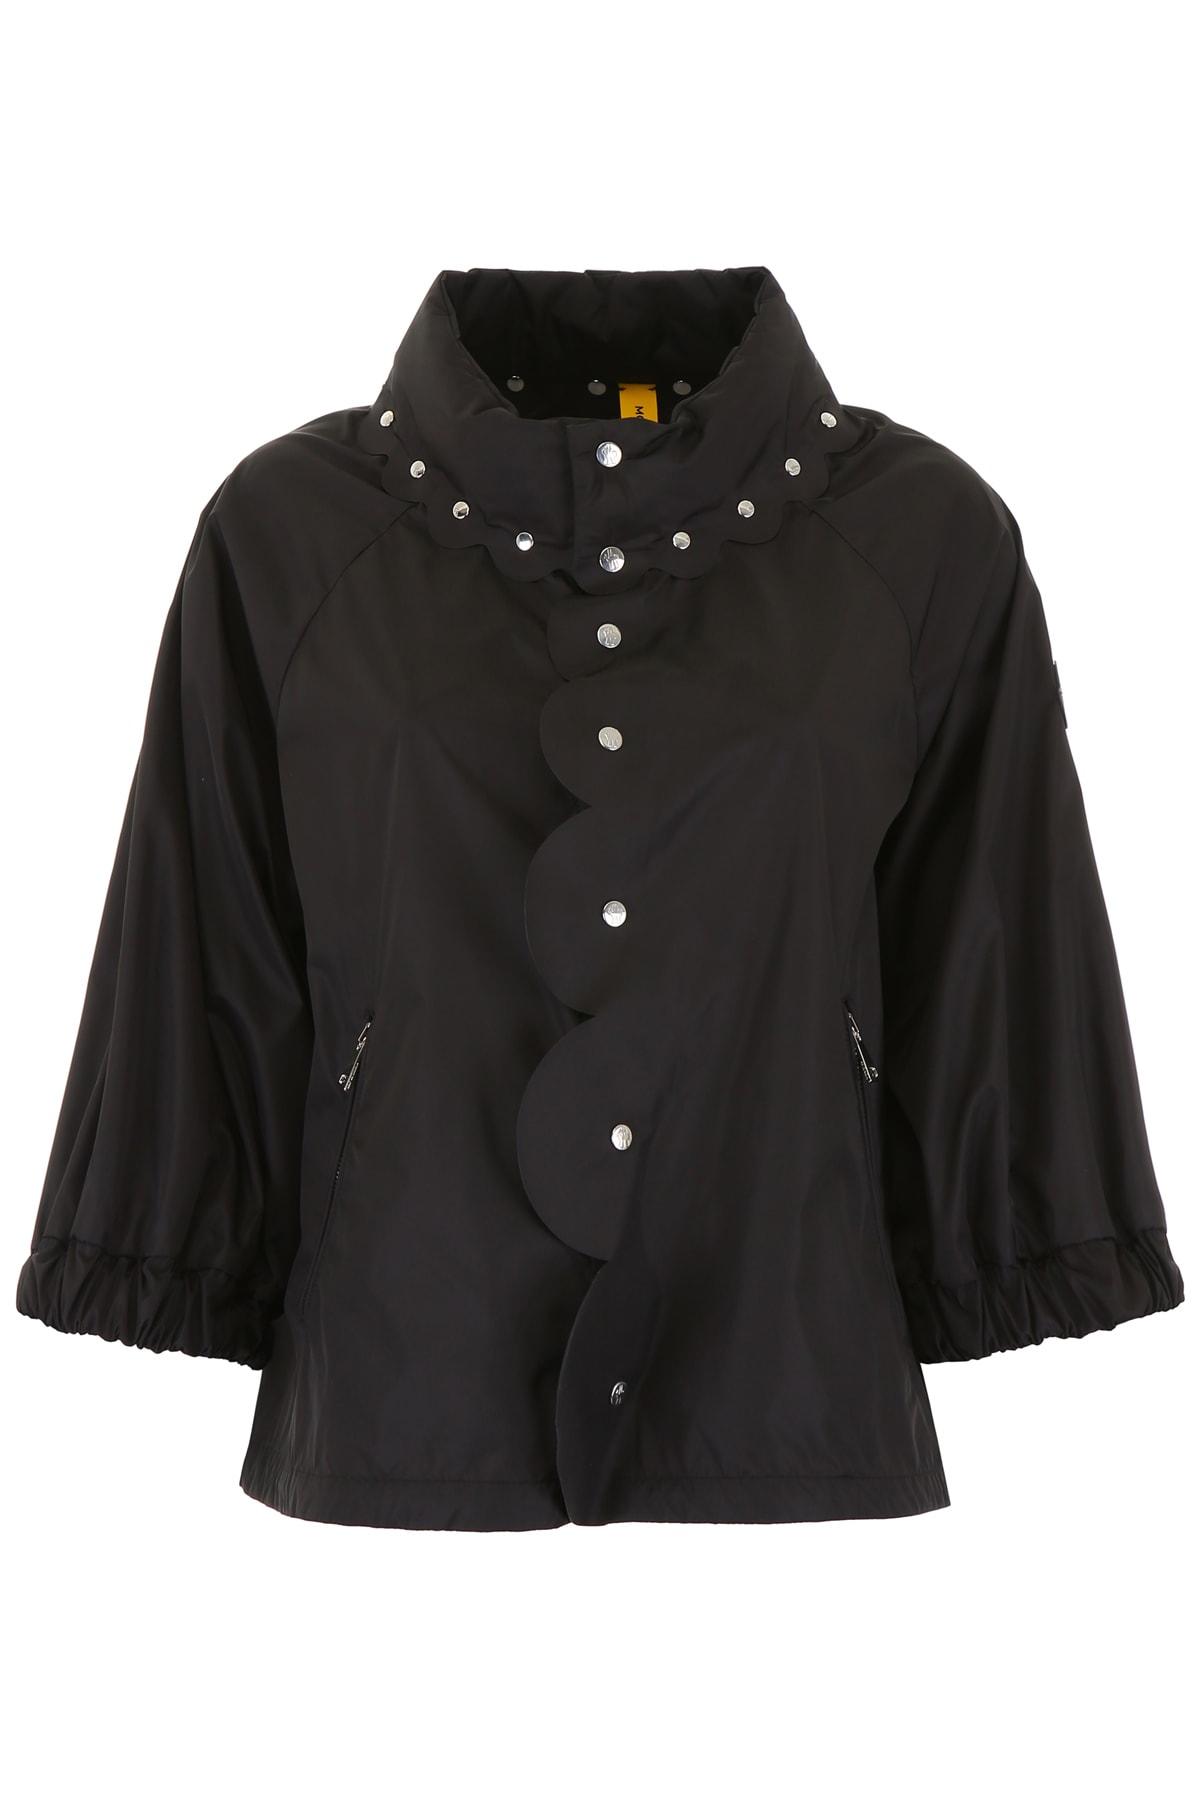 Moncler Moncler Genius 6 Osmium Jacket